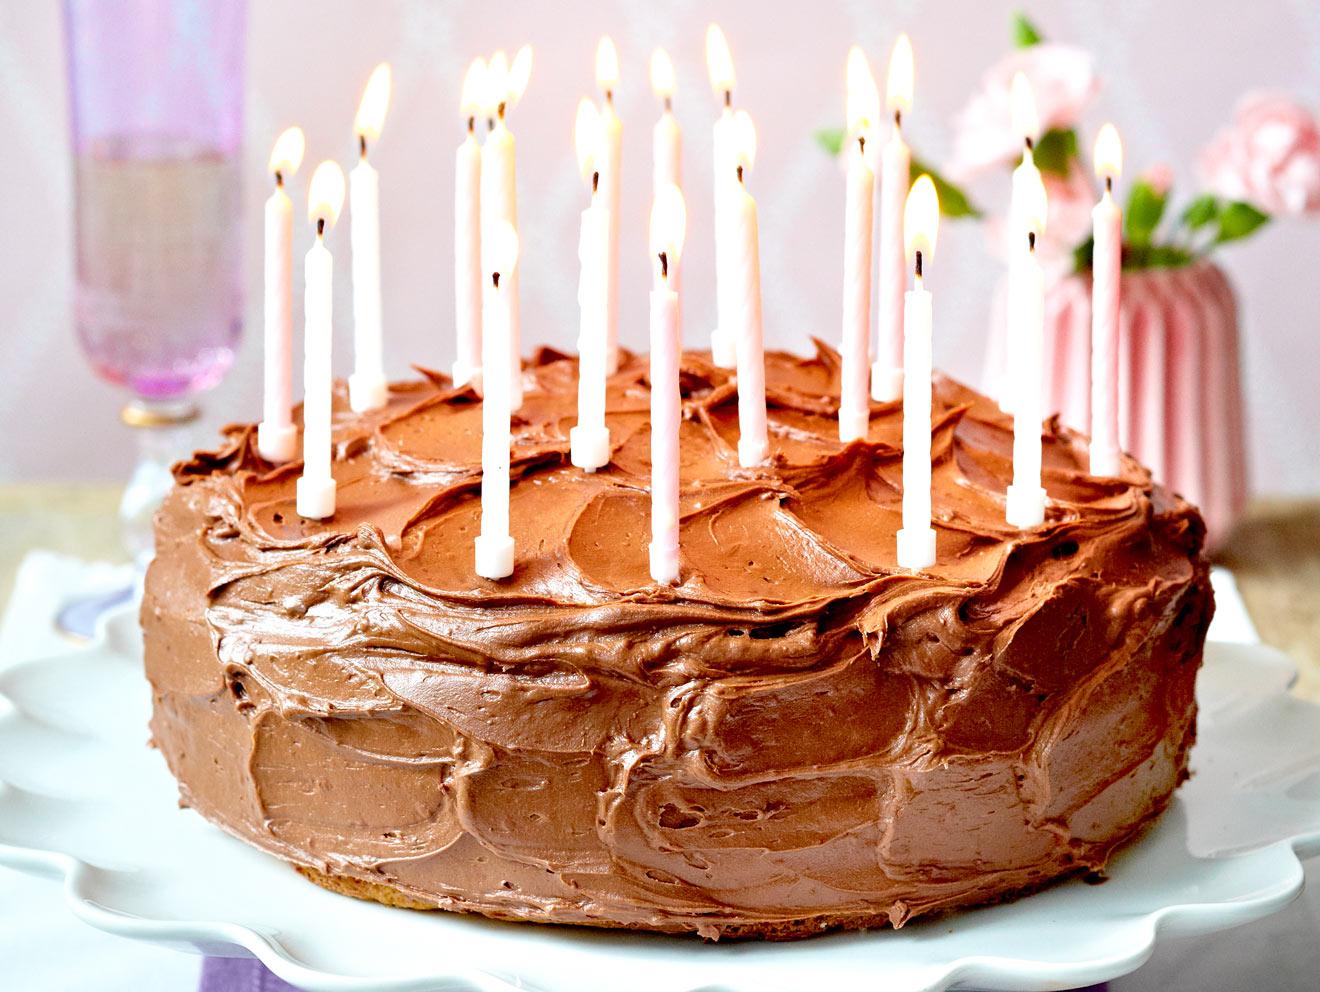 Geburtstagstorten - Die Besten Rezepte | Lecker bei Bilder Geburtstagstorten